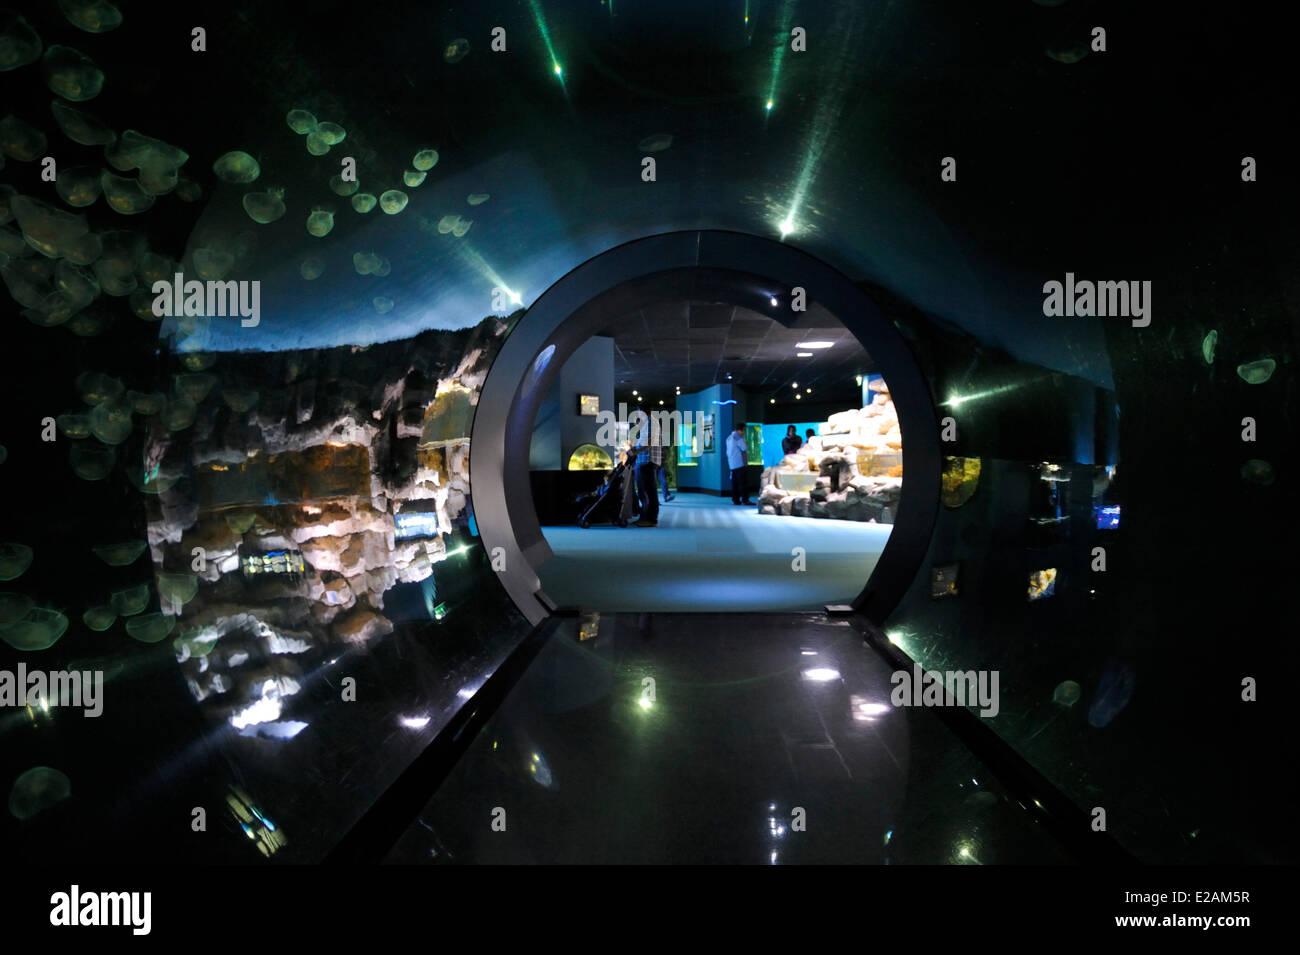 France, Charente Maritime, La Rochelle, Aquarium La Rochelle, Compulsory Mention, airlock - Stock Image